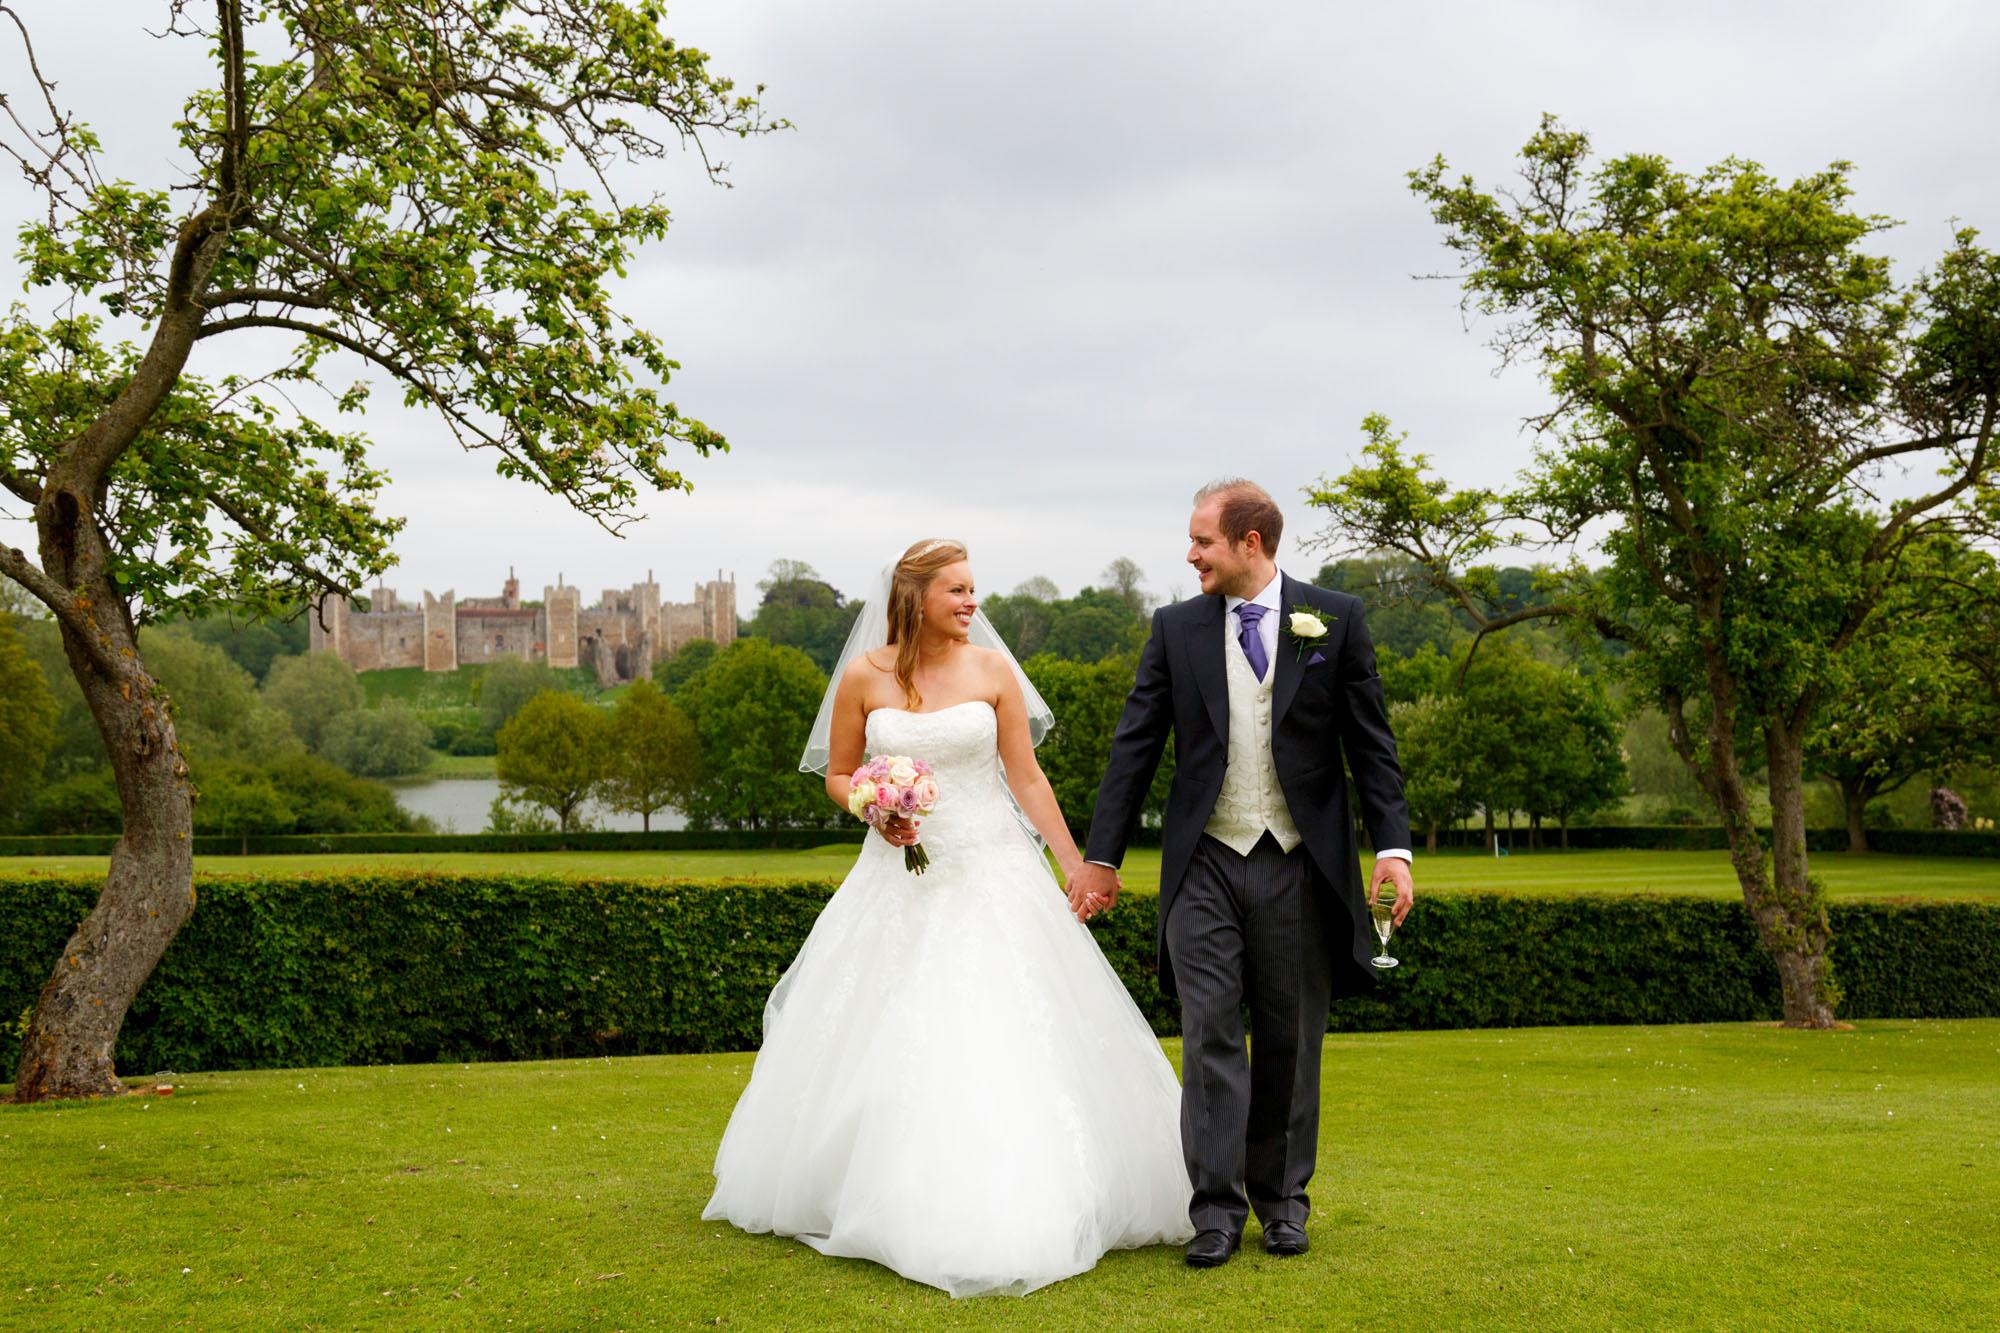 Framlingham College wedding photography | Kirsten & Jamie